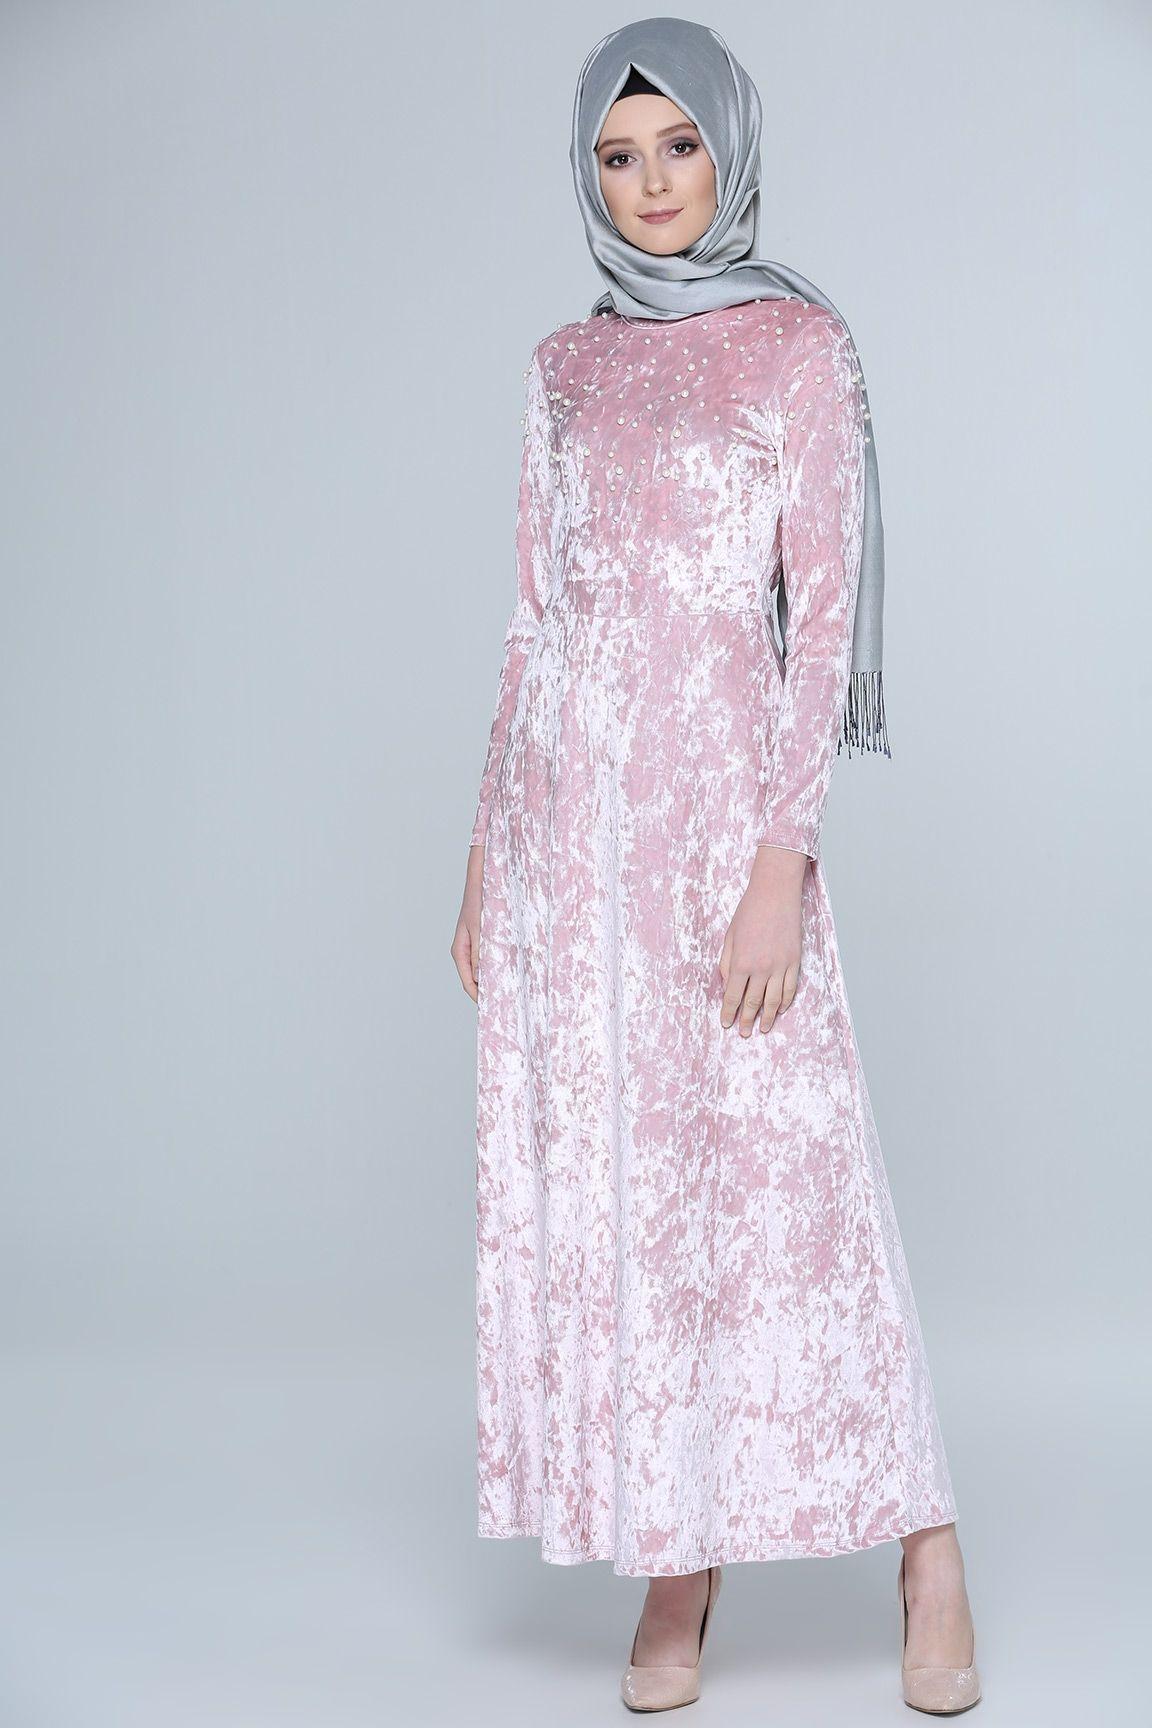 2018 Tozlu Tesettur Abiye Elbise Modelleri High Neck Dress Fashion Dresses